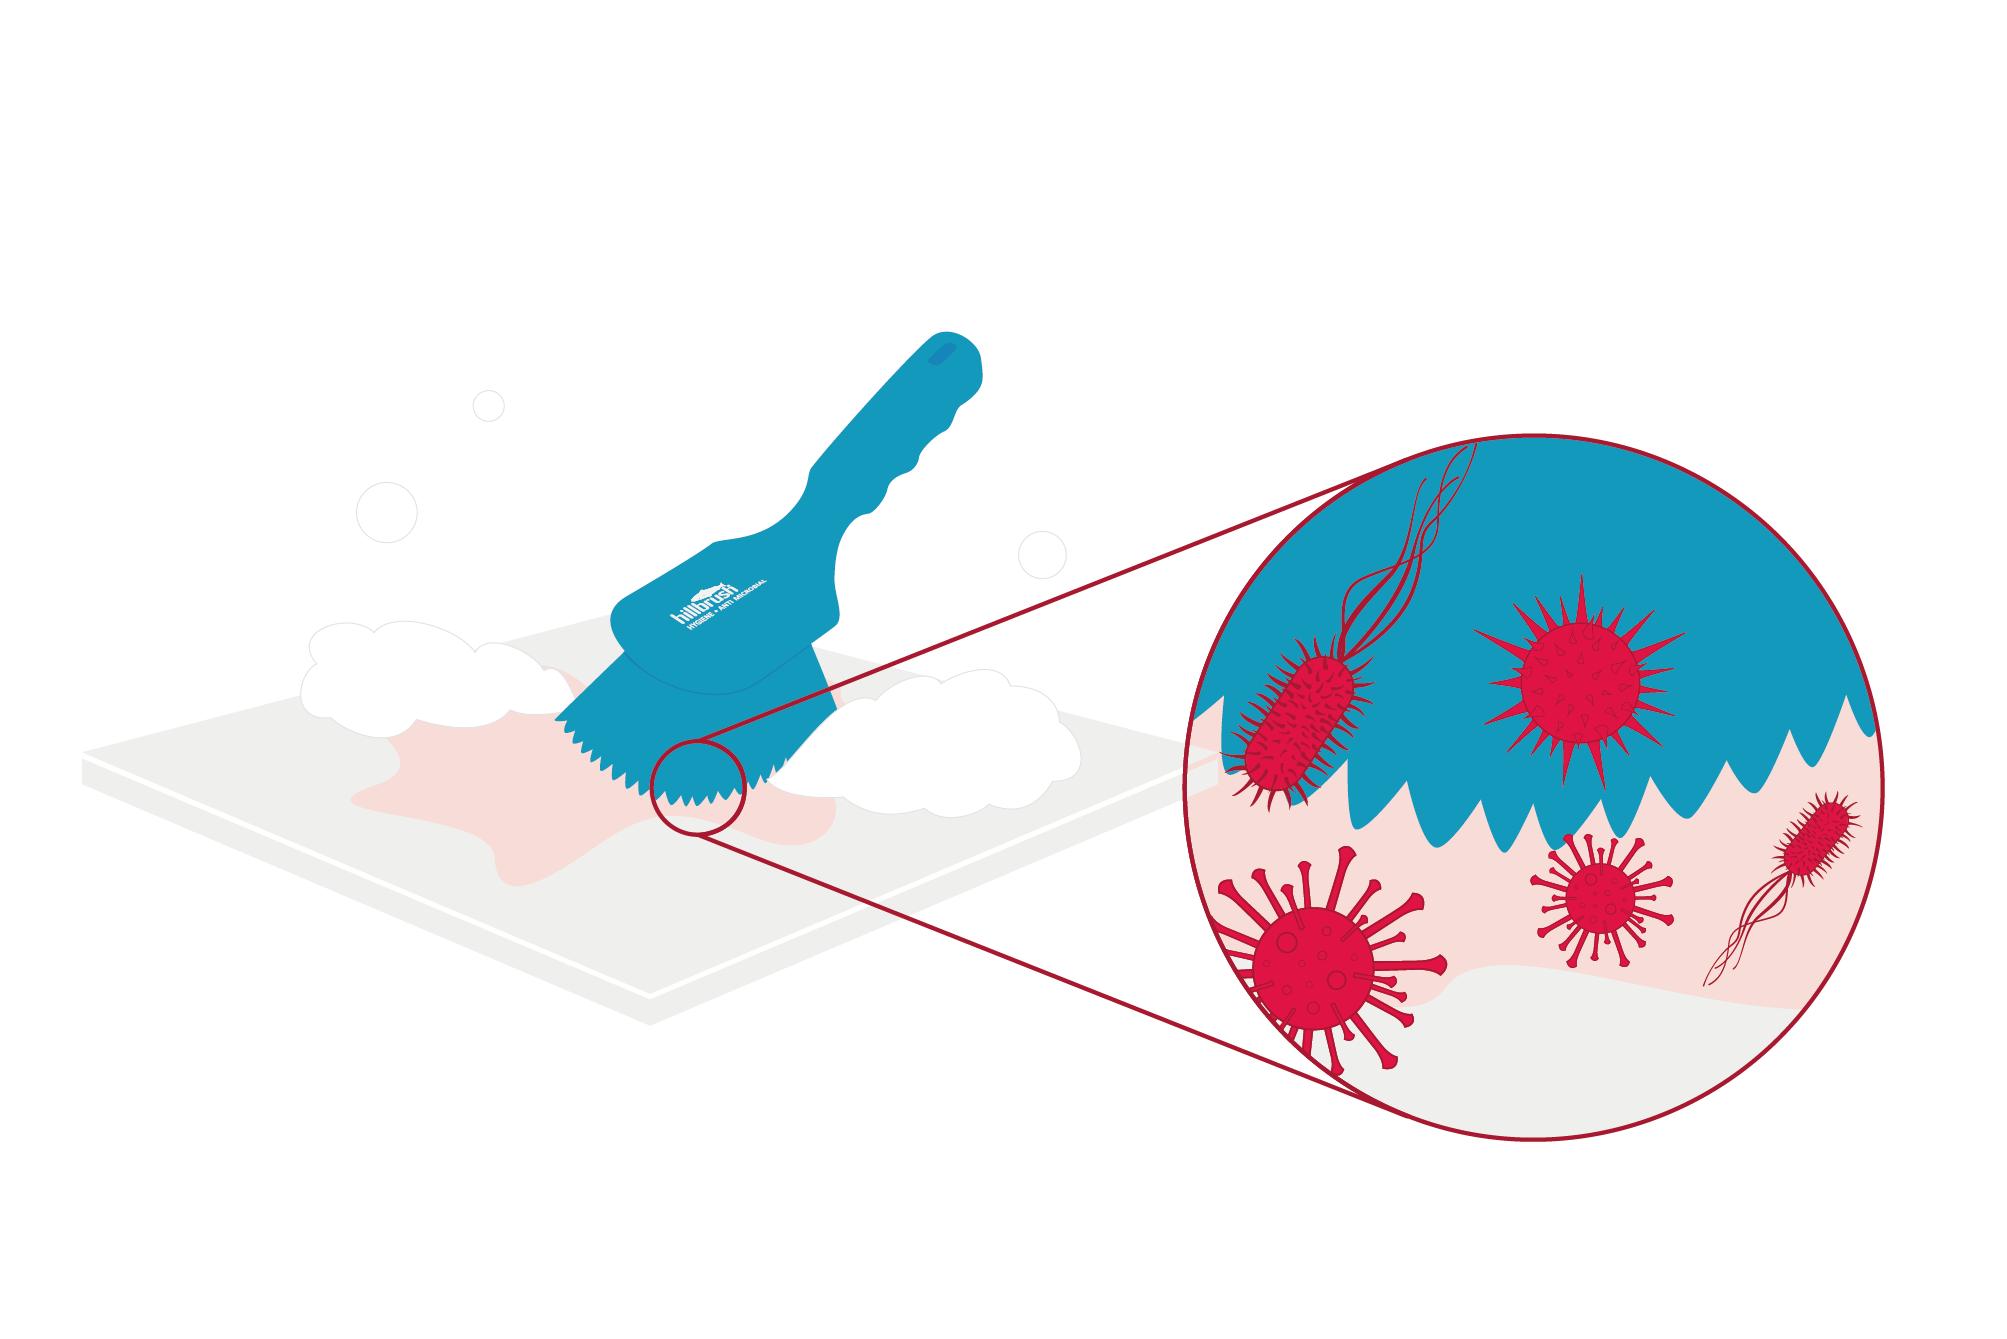 cross contamination diagram